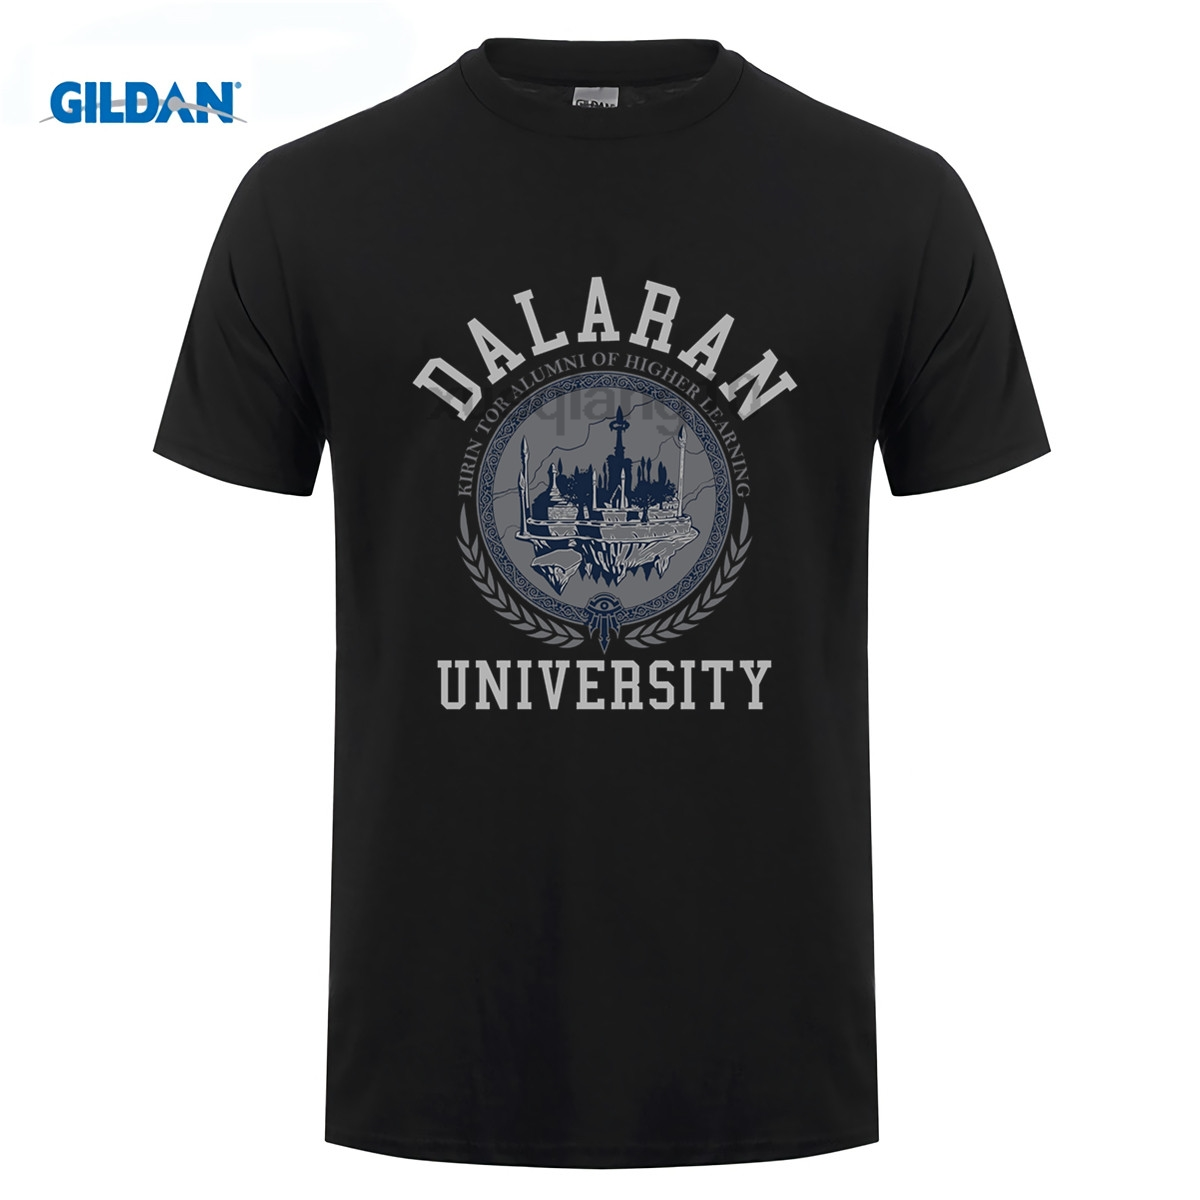 2019 hot sale game   t     shirt   brand   t     shirt   World of Warcraft Men's Dalaran University Premium   T  -  Shirt